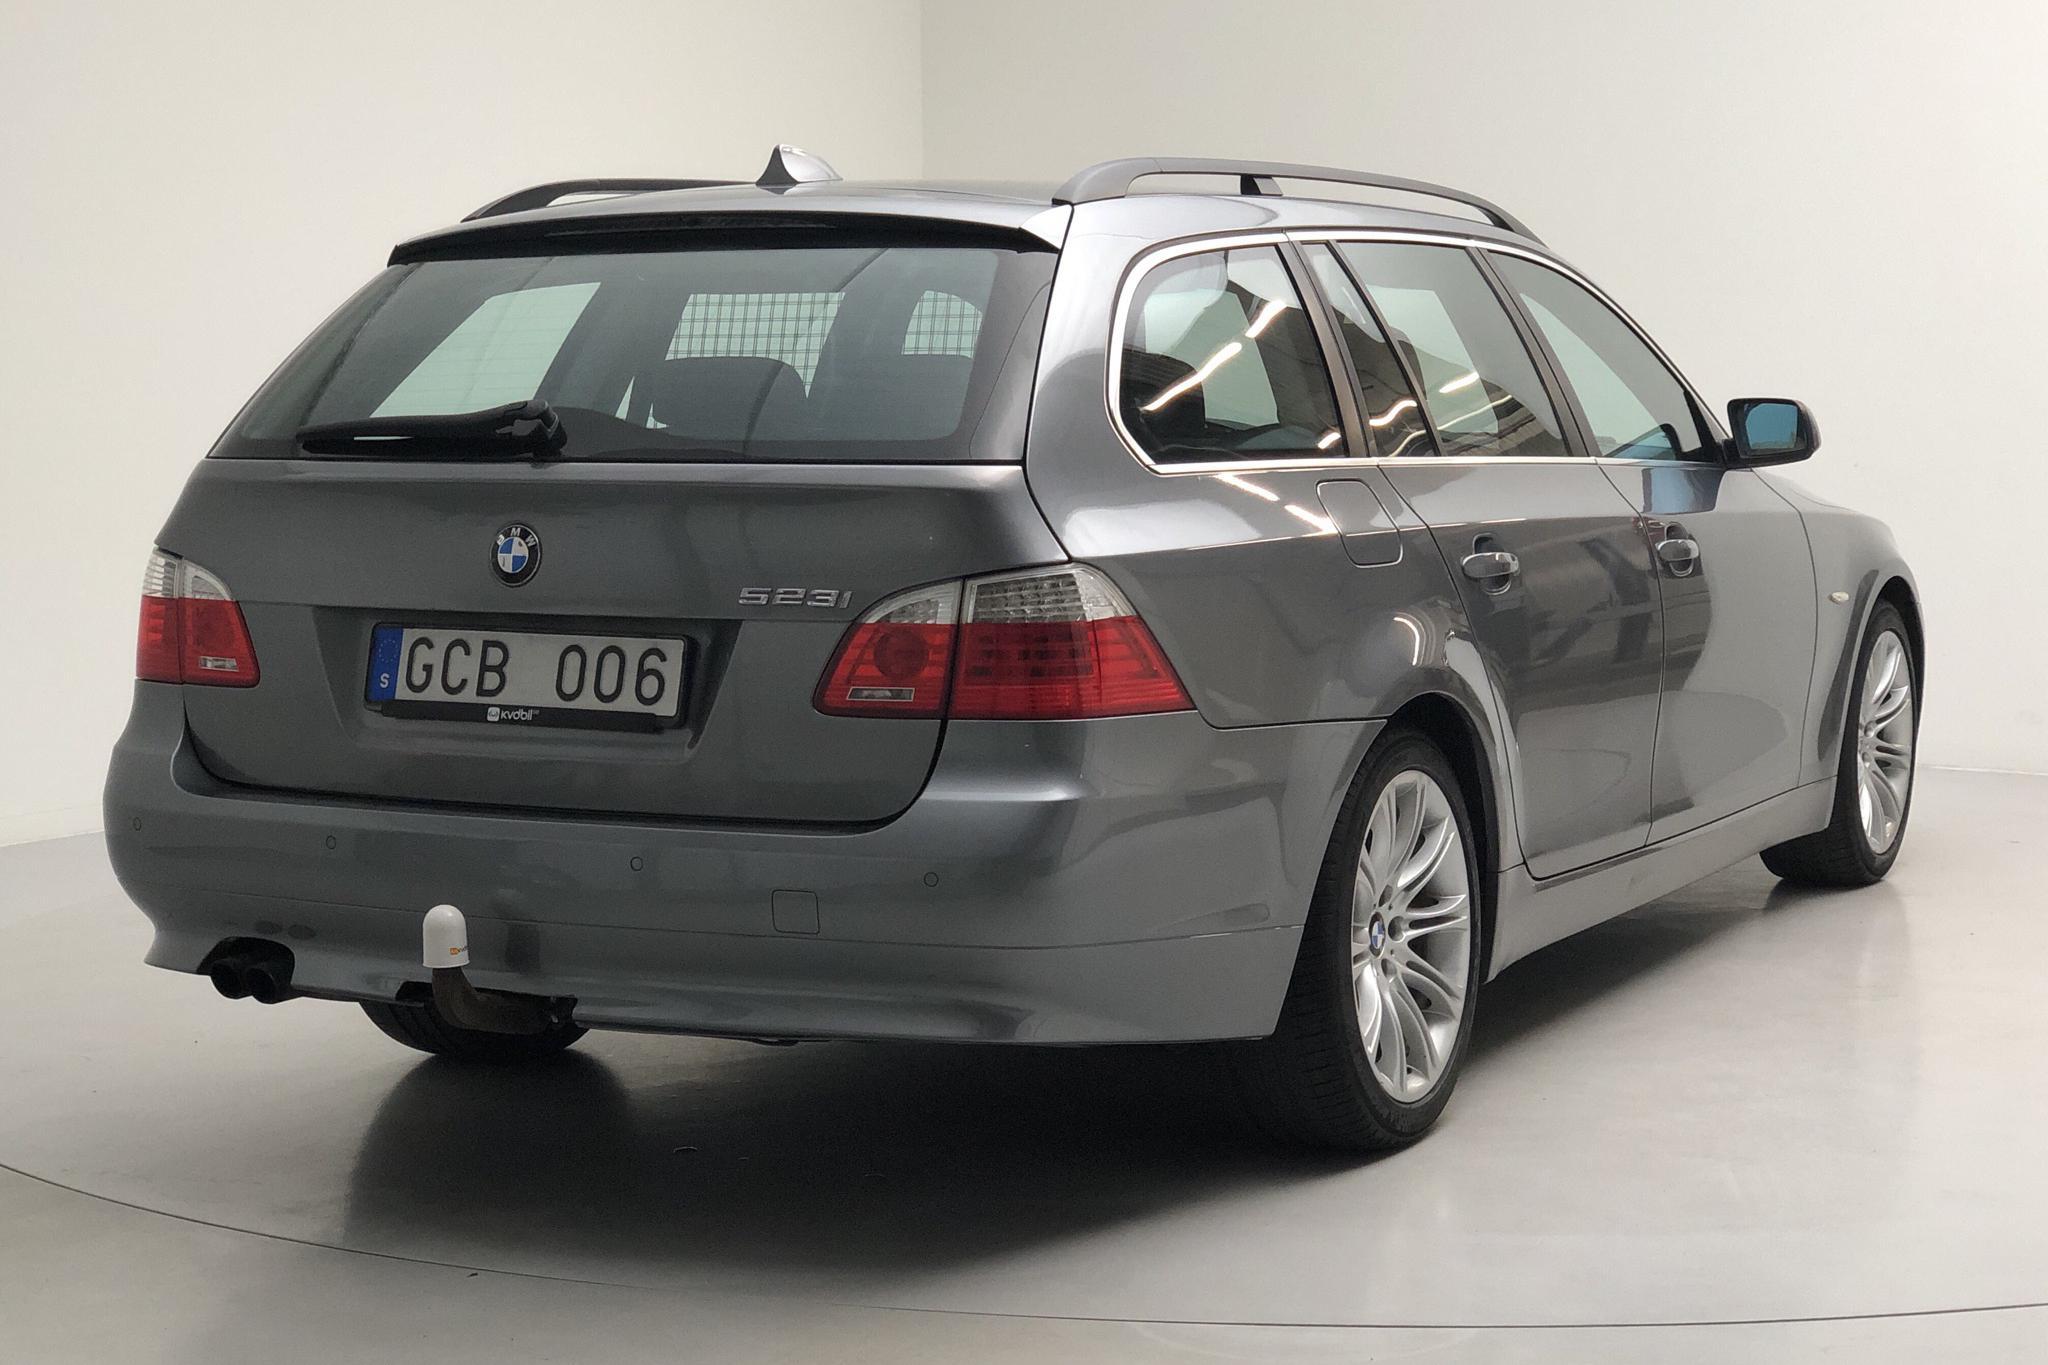 BMW 523I TOURING - 20 345 mil - Manuell - grå - 2007